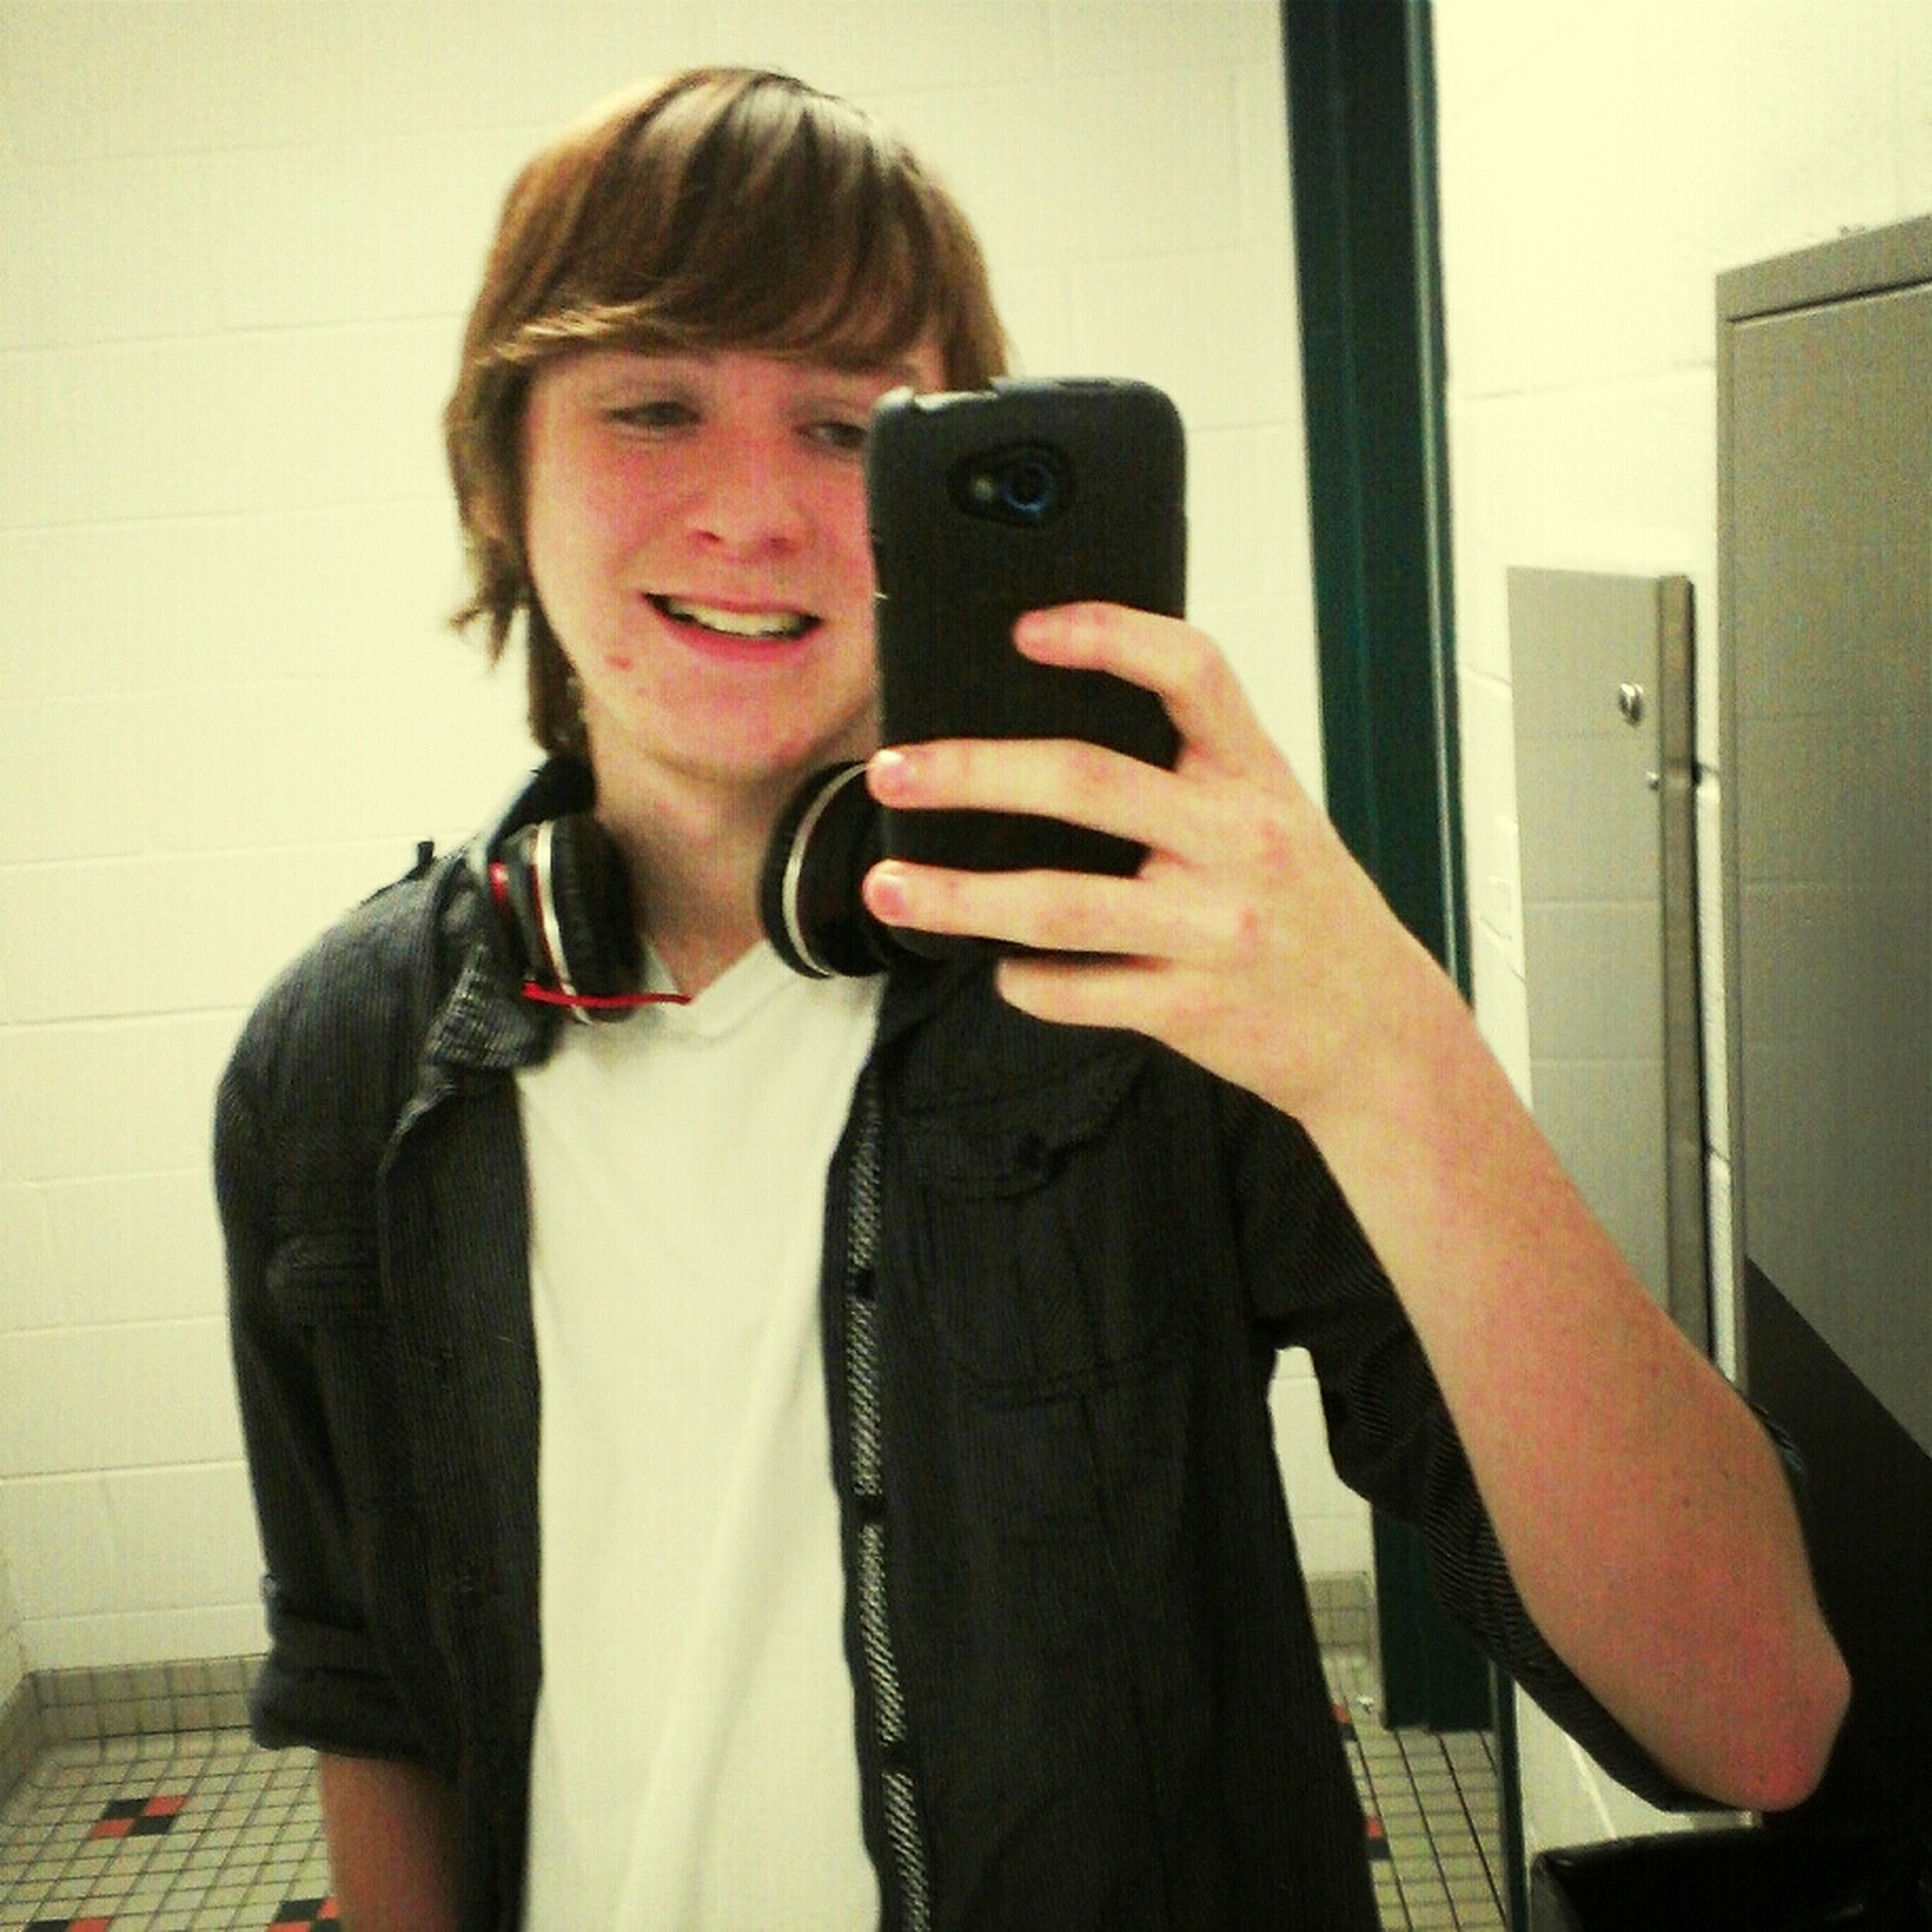 My Long Hair When I Had It